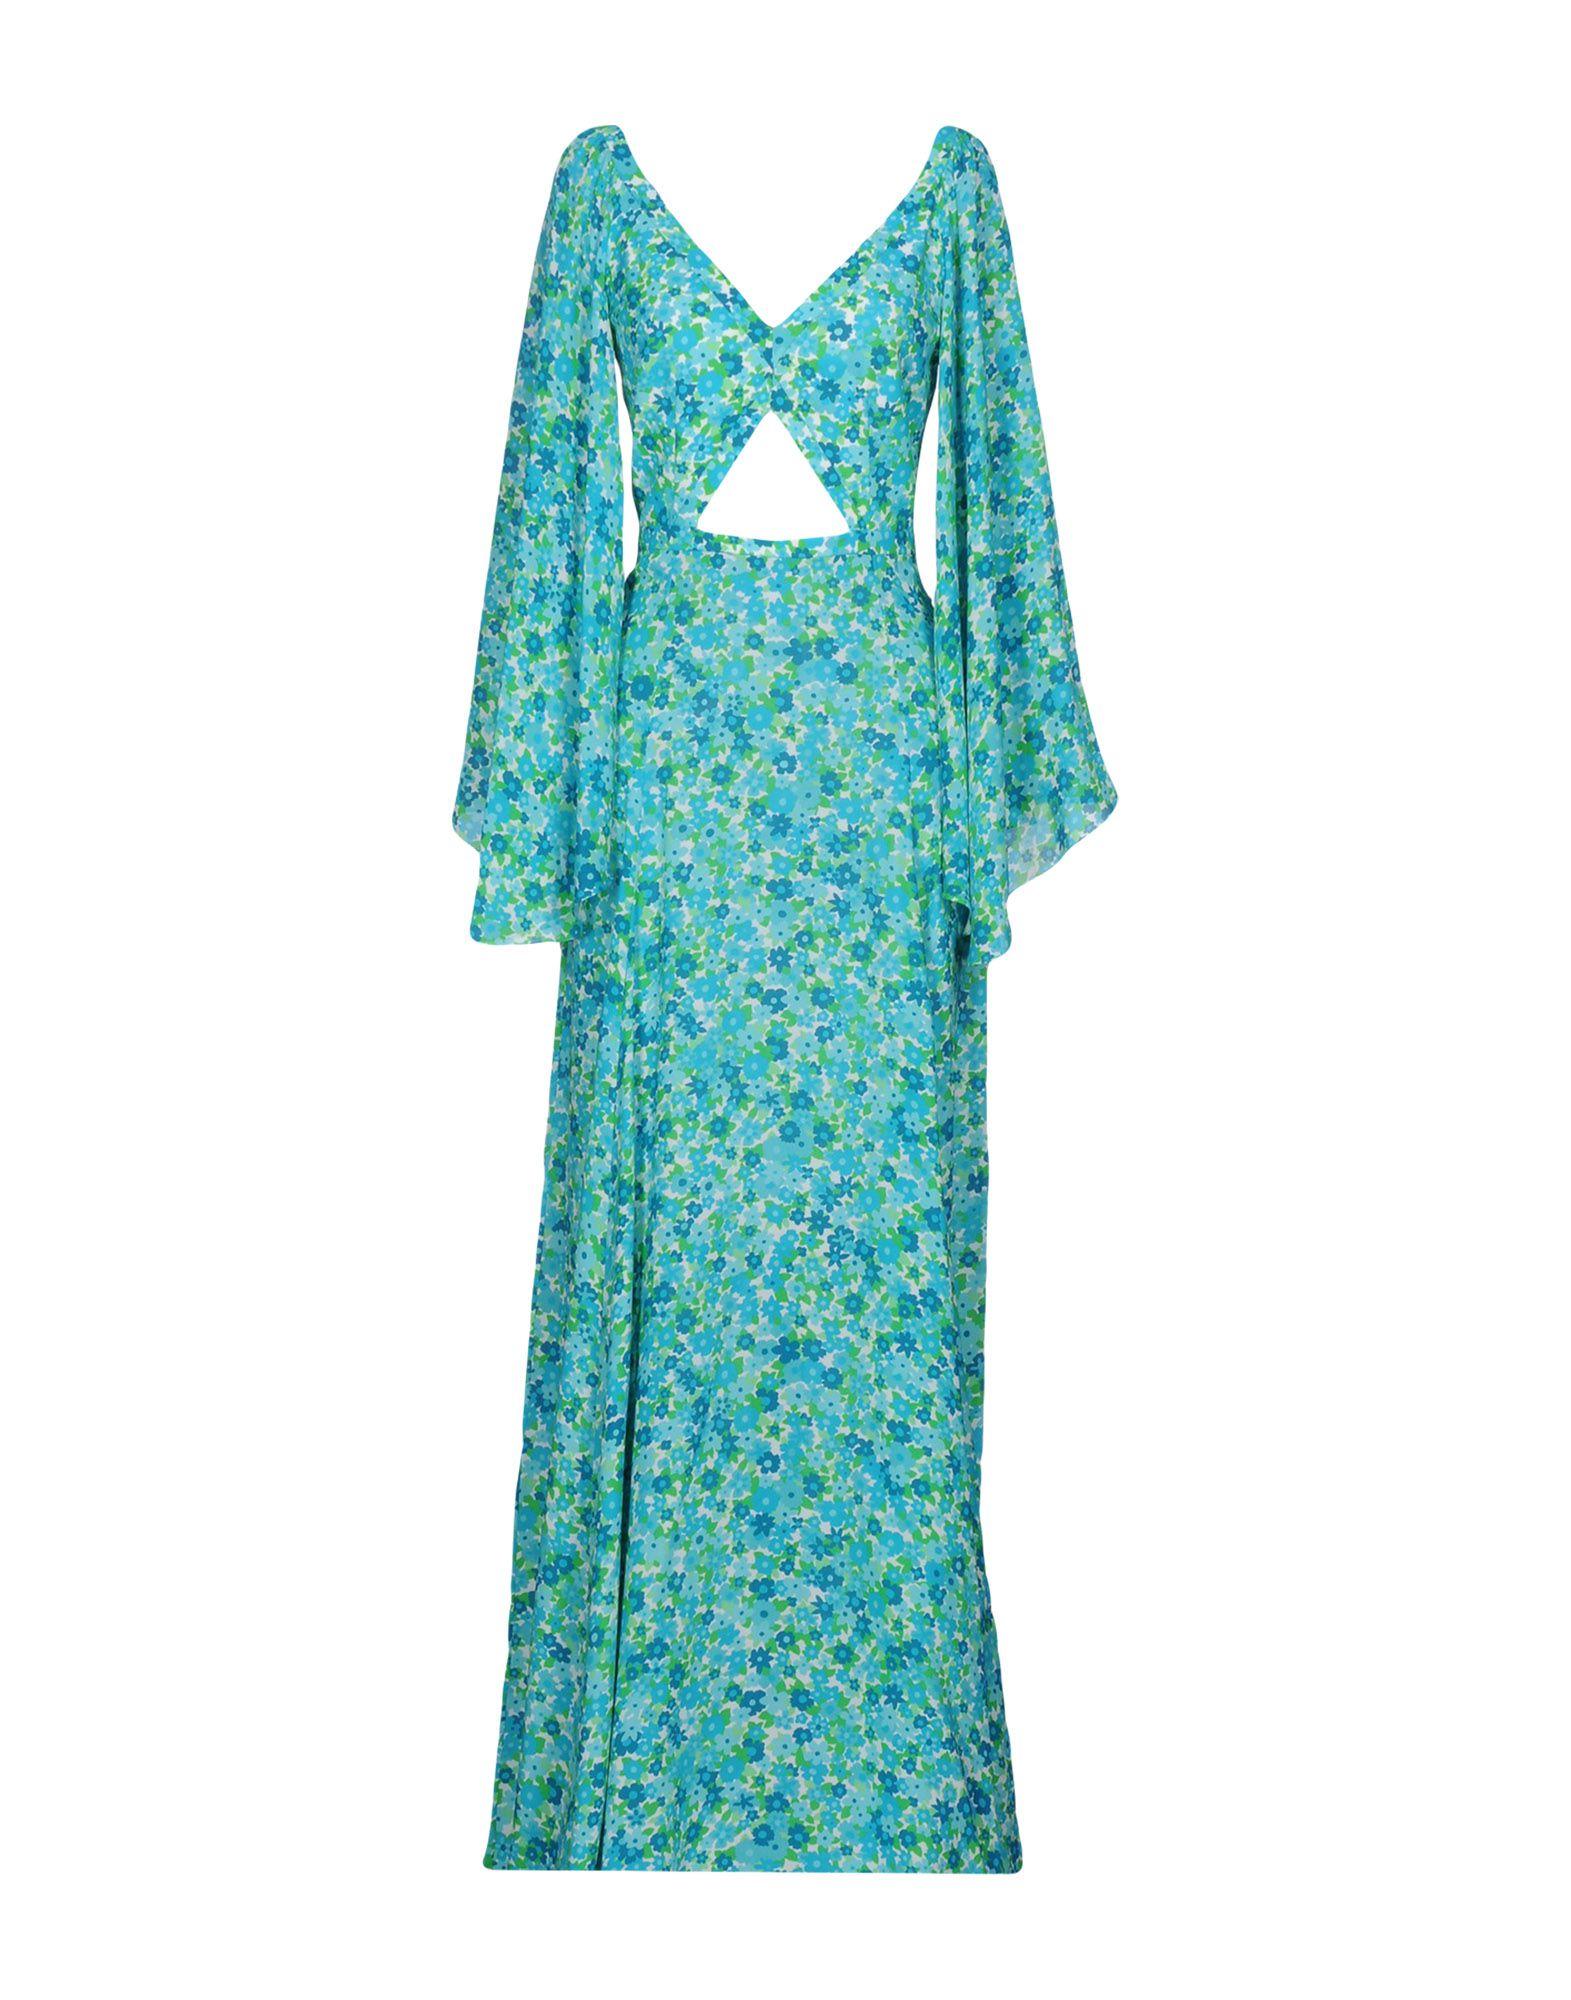 MICHAEL KORS COLLECTION Длинное платье michael kors collection сандалии byrne